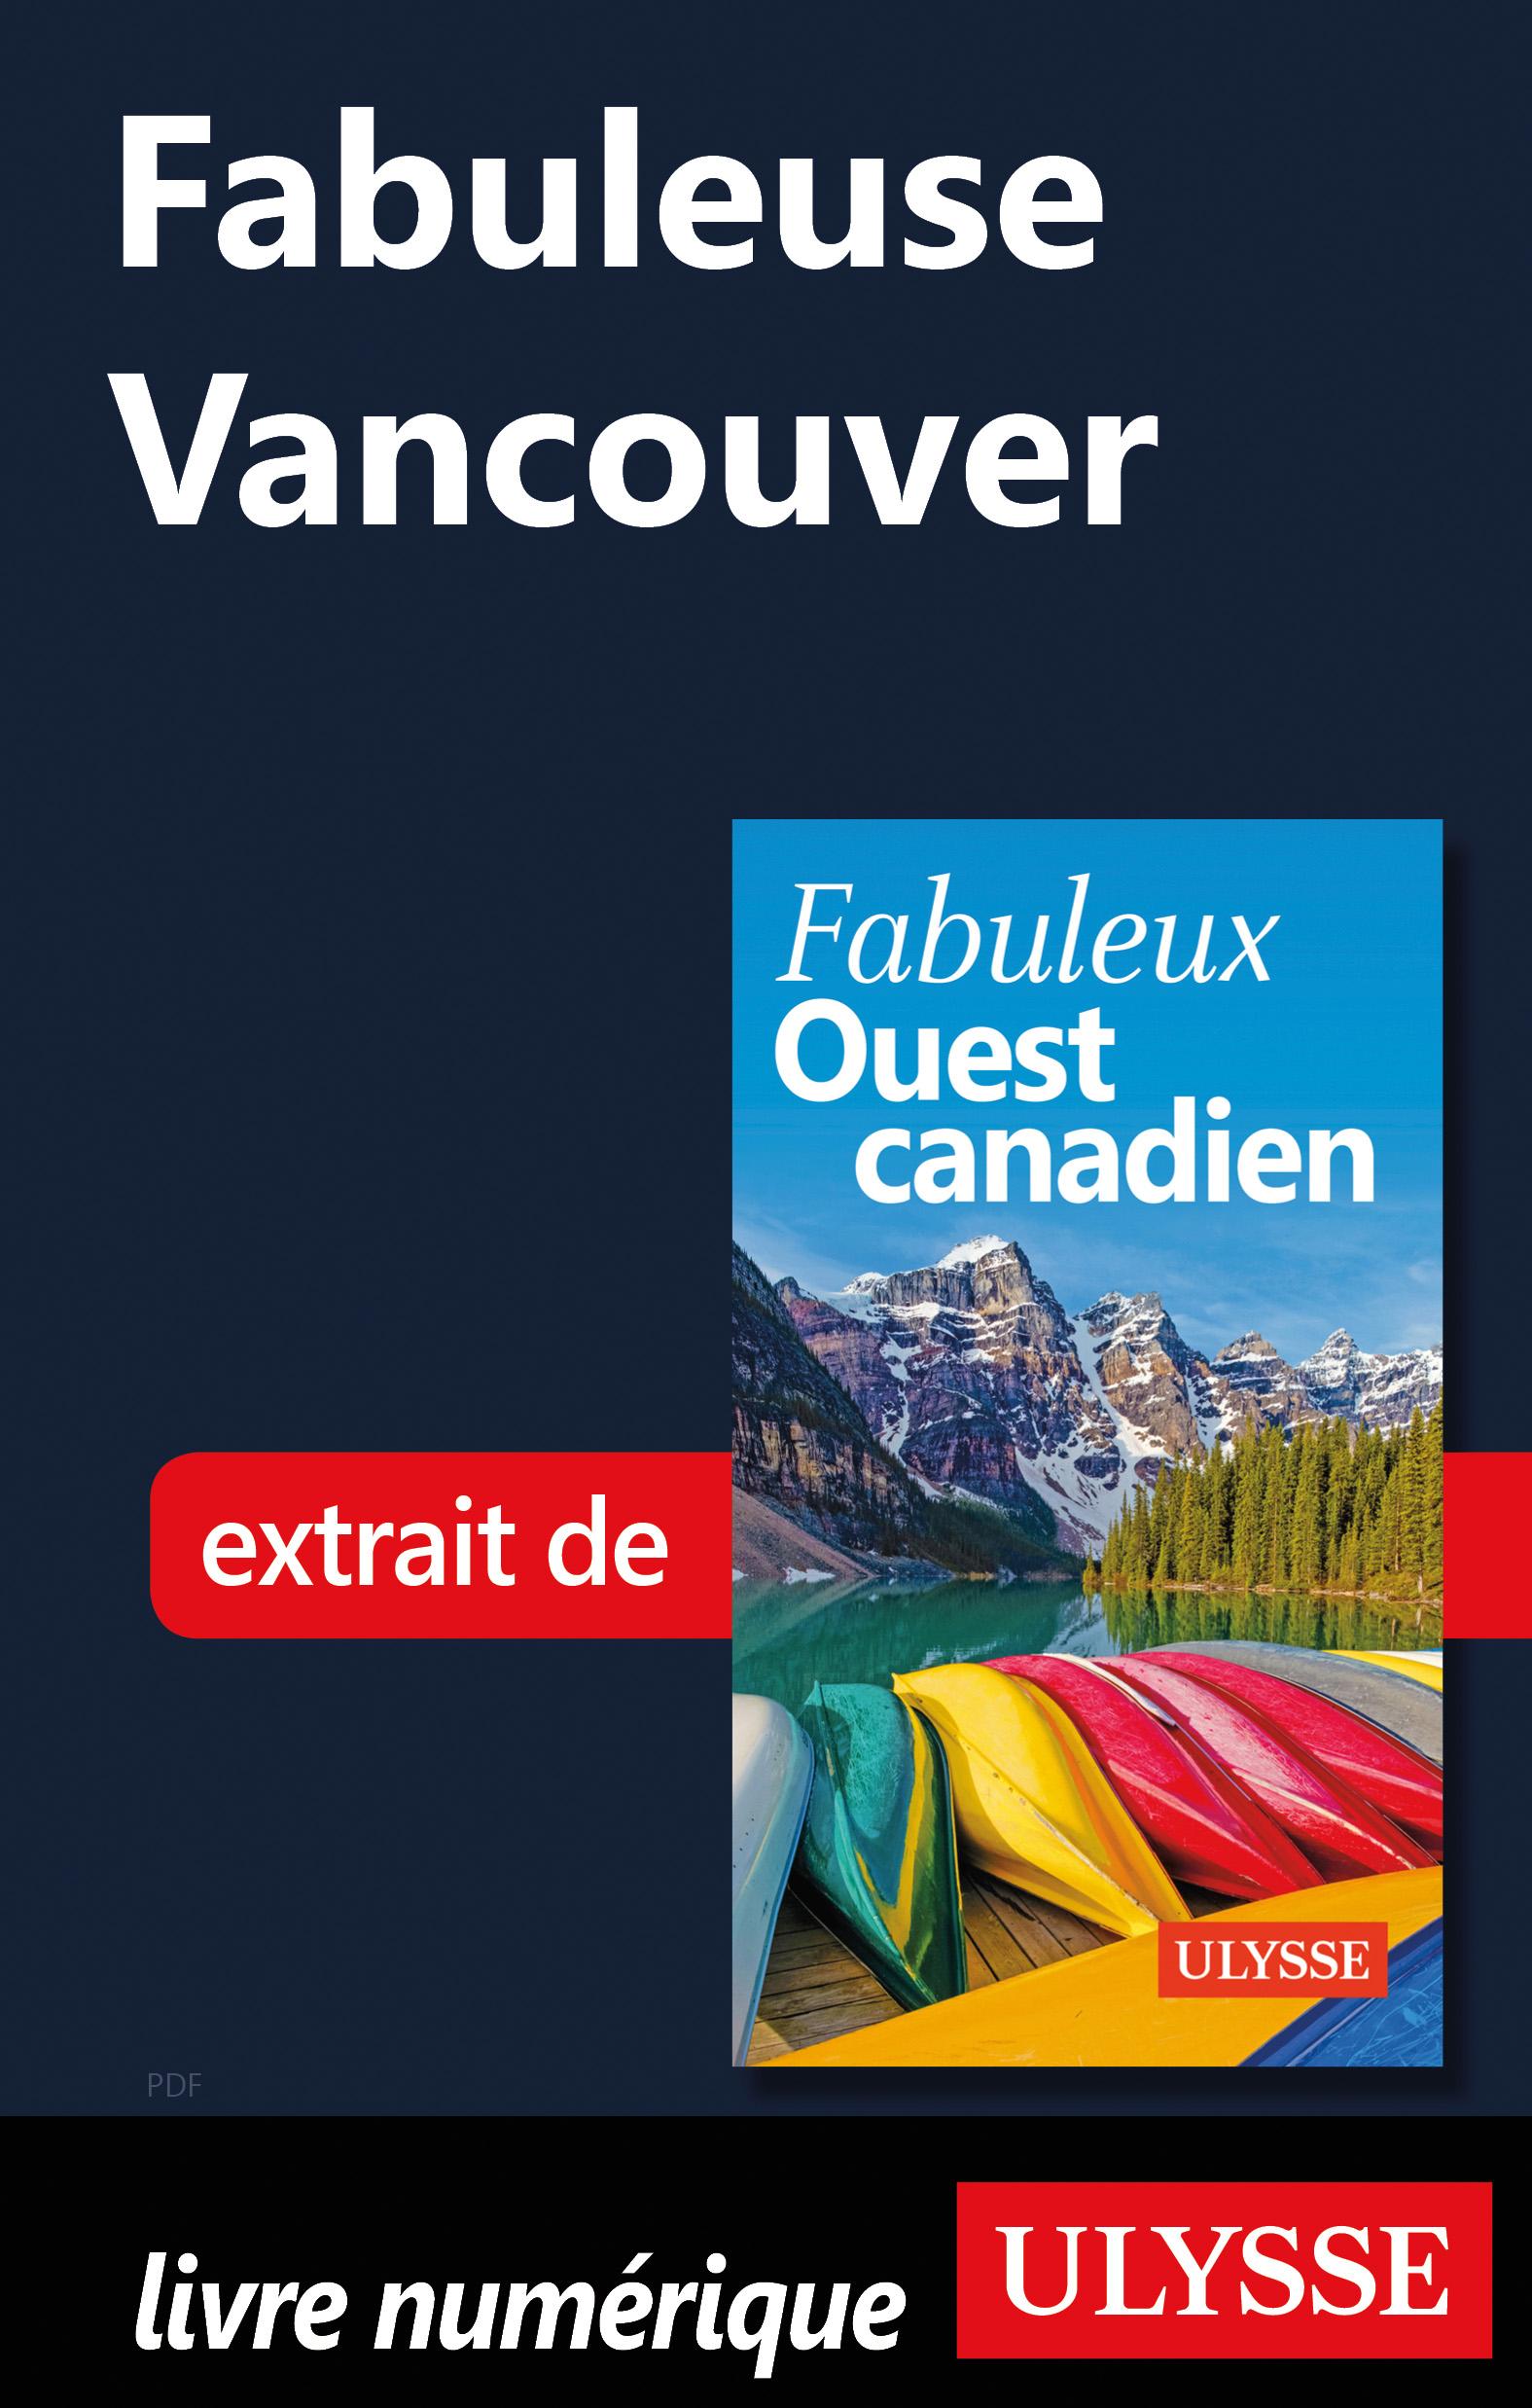 Fabuleuse Vancouver